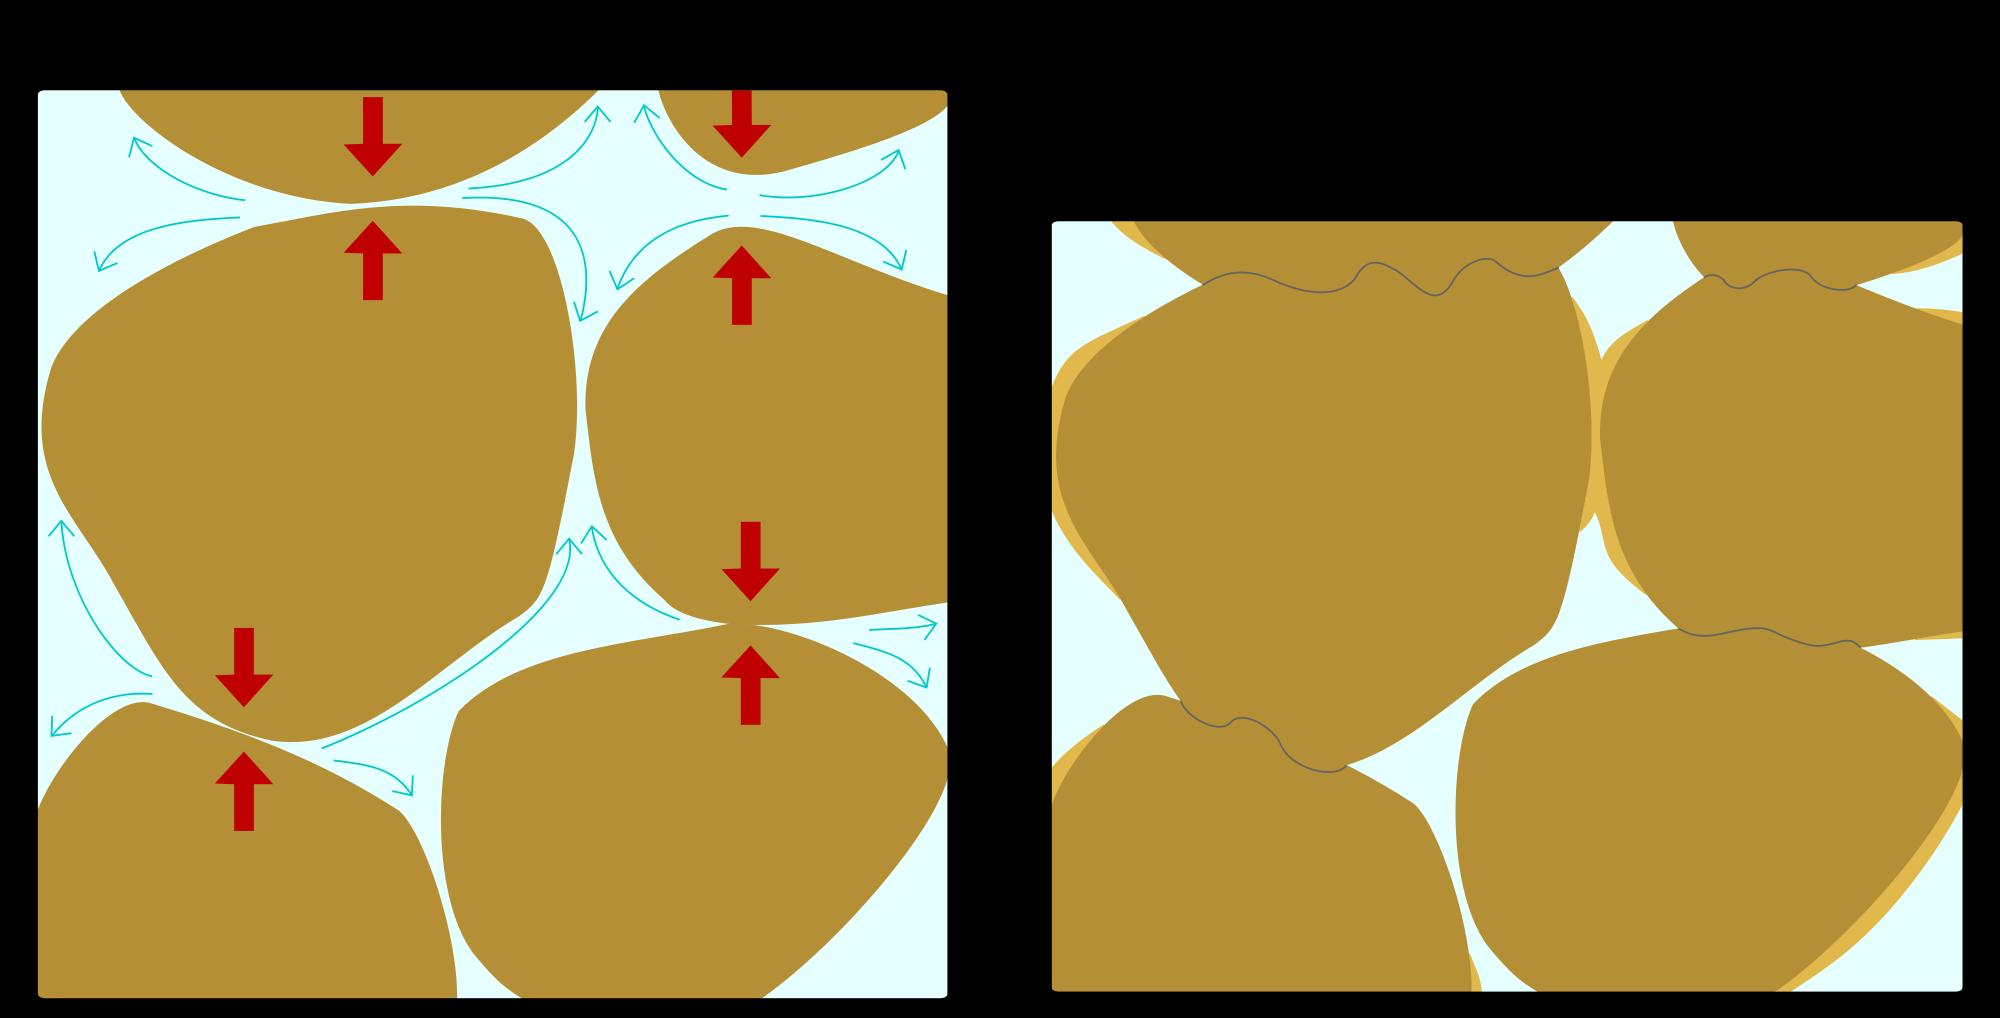 Clipart rock sediment. Page wikimedia image